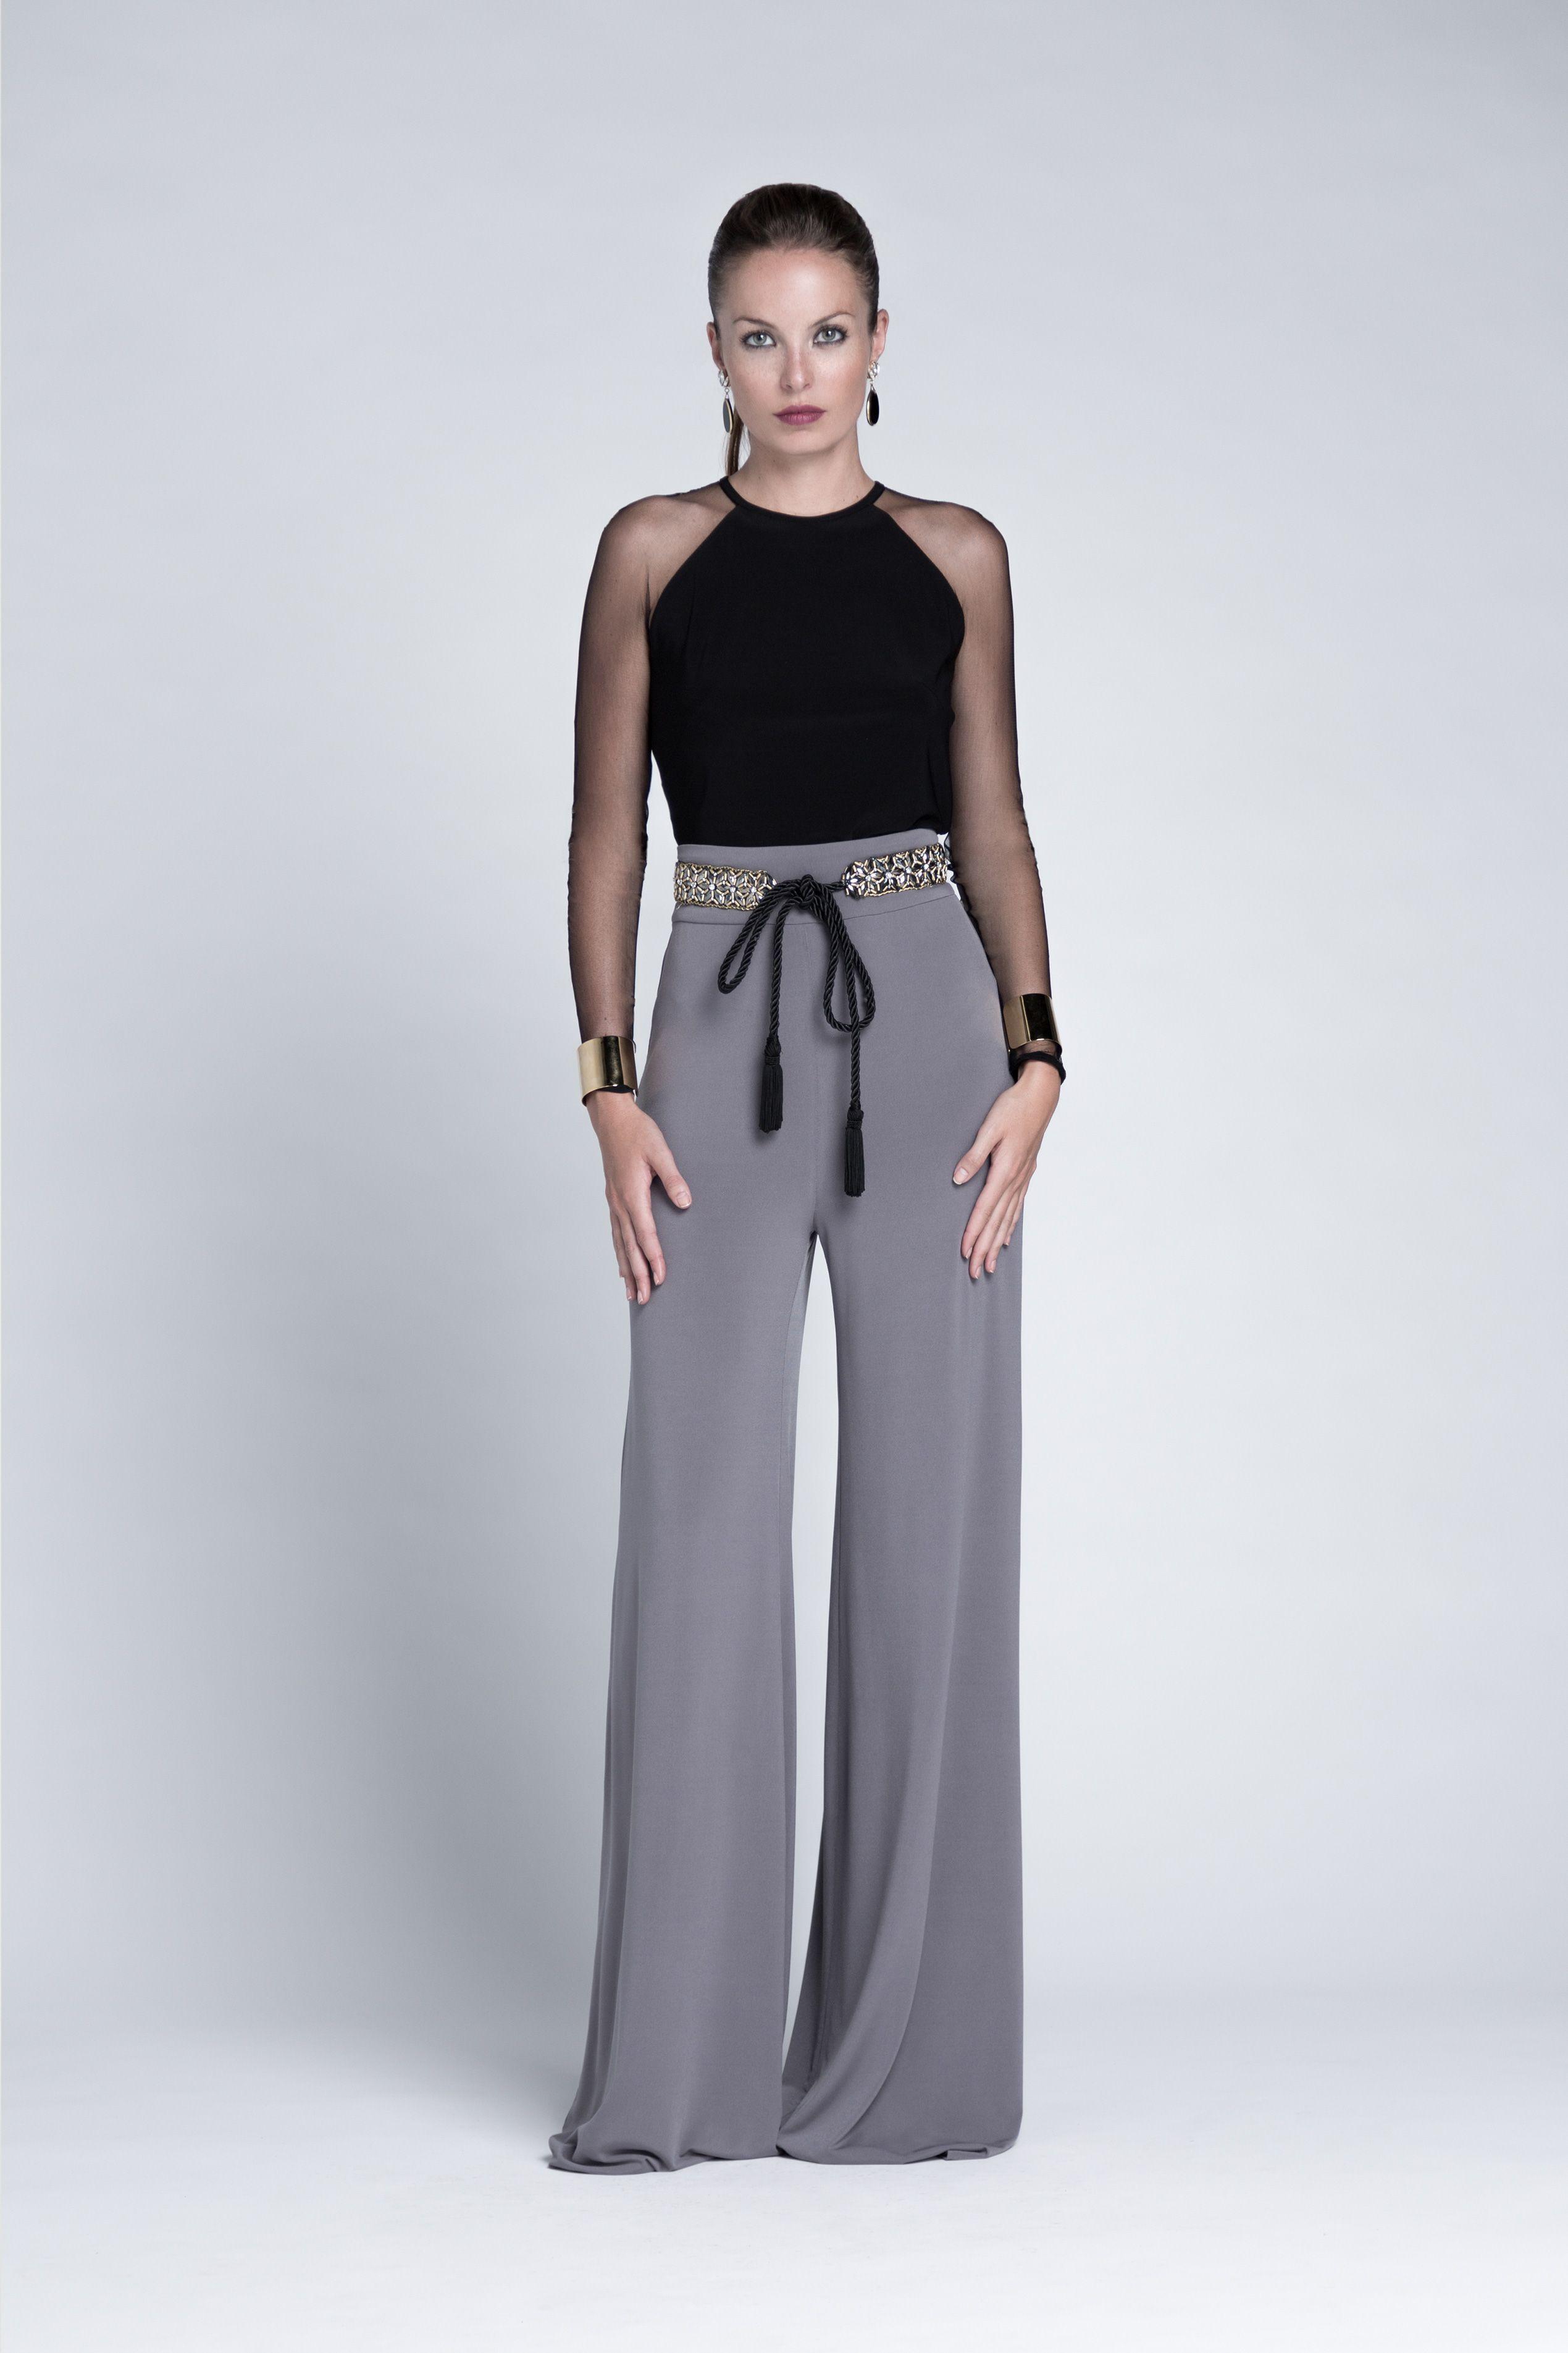 Trajes De Mujer Para Bodas Con Pantalon